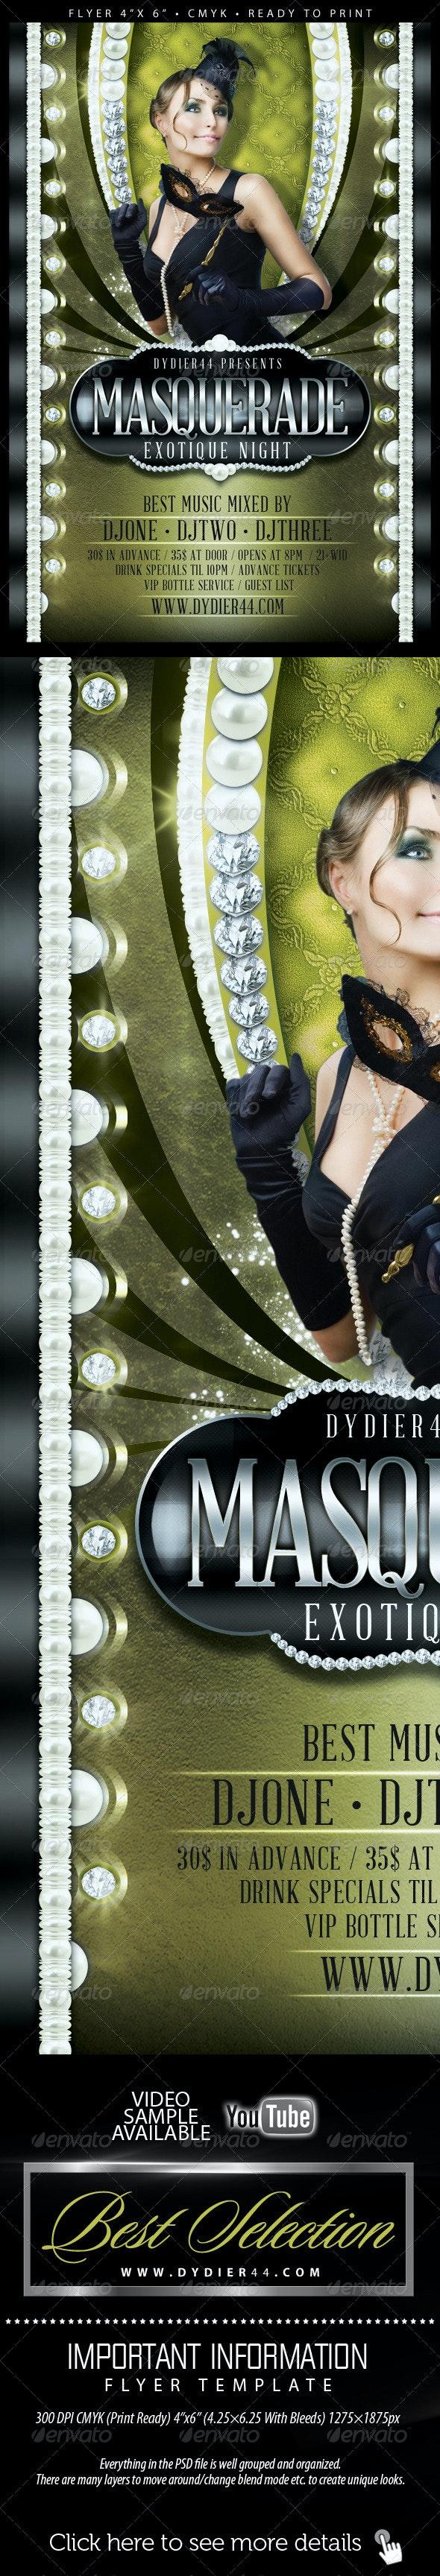 Masquerade (Flyer Template 4x6) - Flyers Print Templates